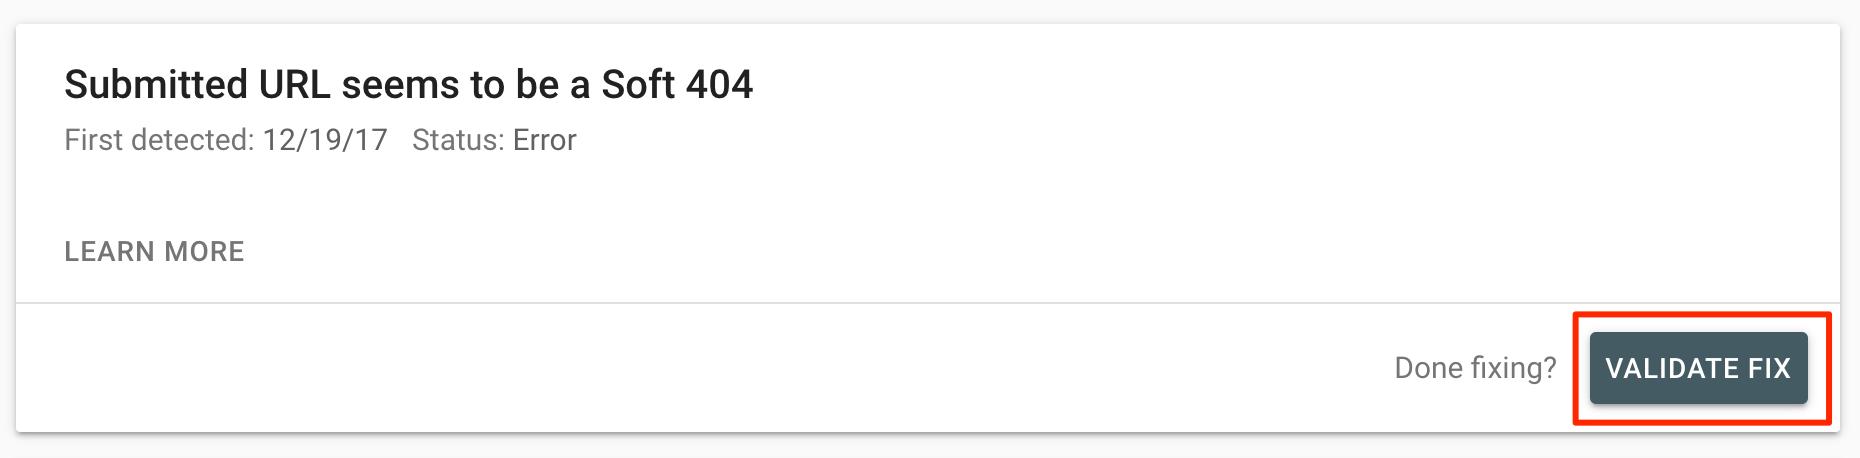 Validate Fix Soft 404 error